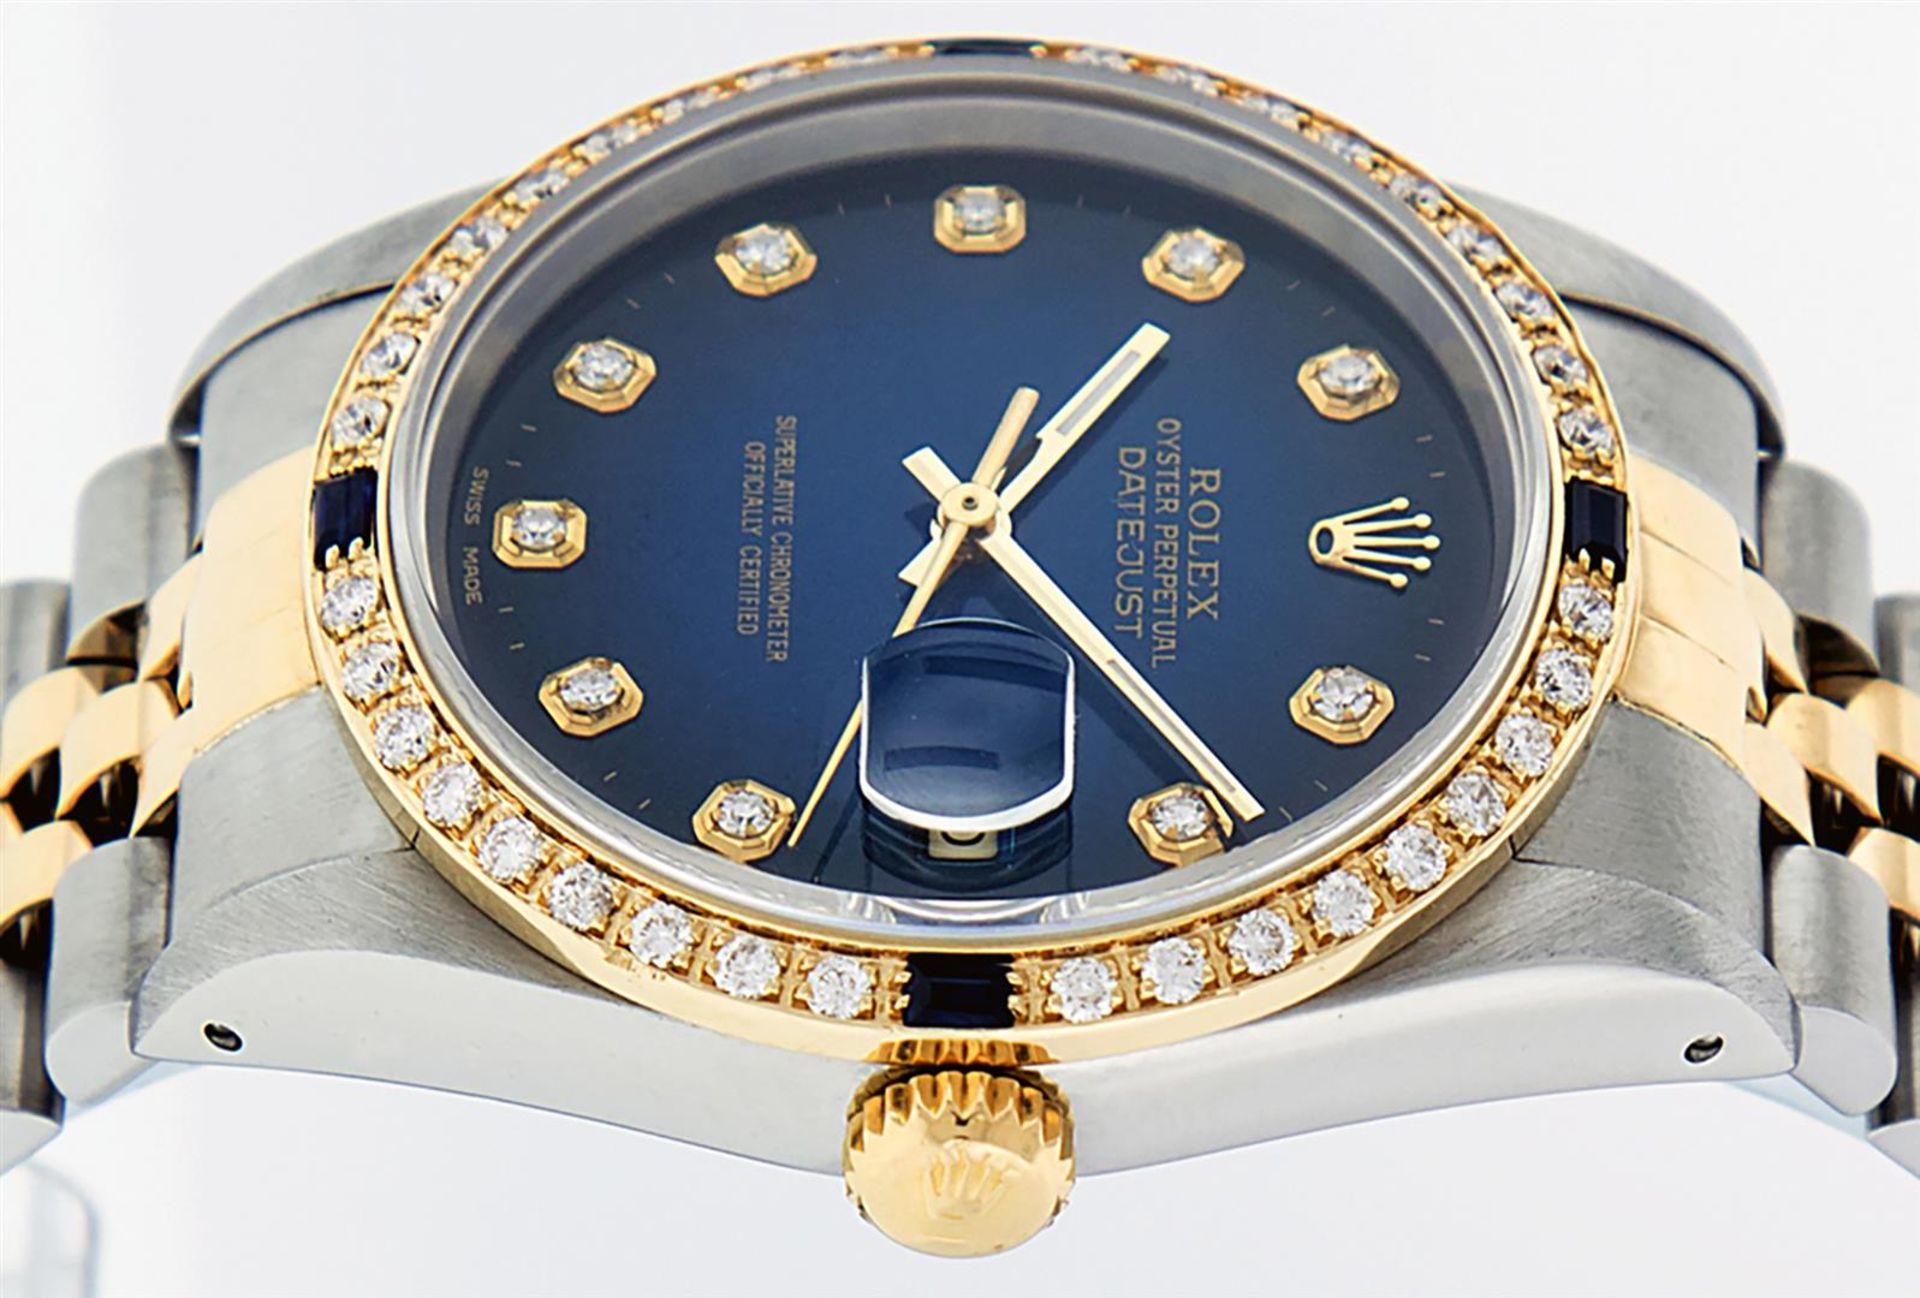 Rolex Mens 2 Tone Blue Vignette Diamond & Sapphire Datejust Wristwatch - Image 4 of 9